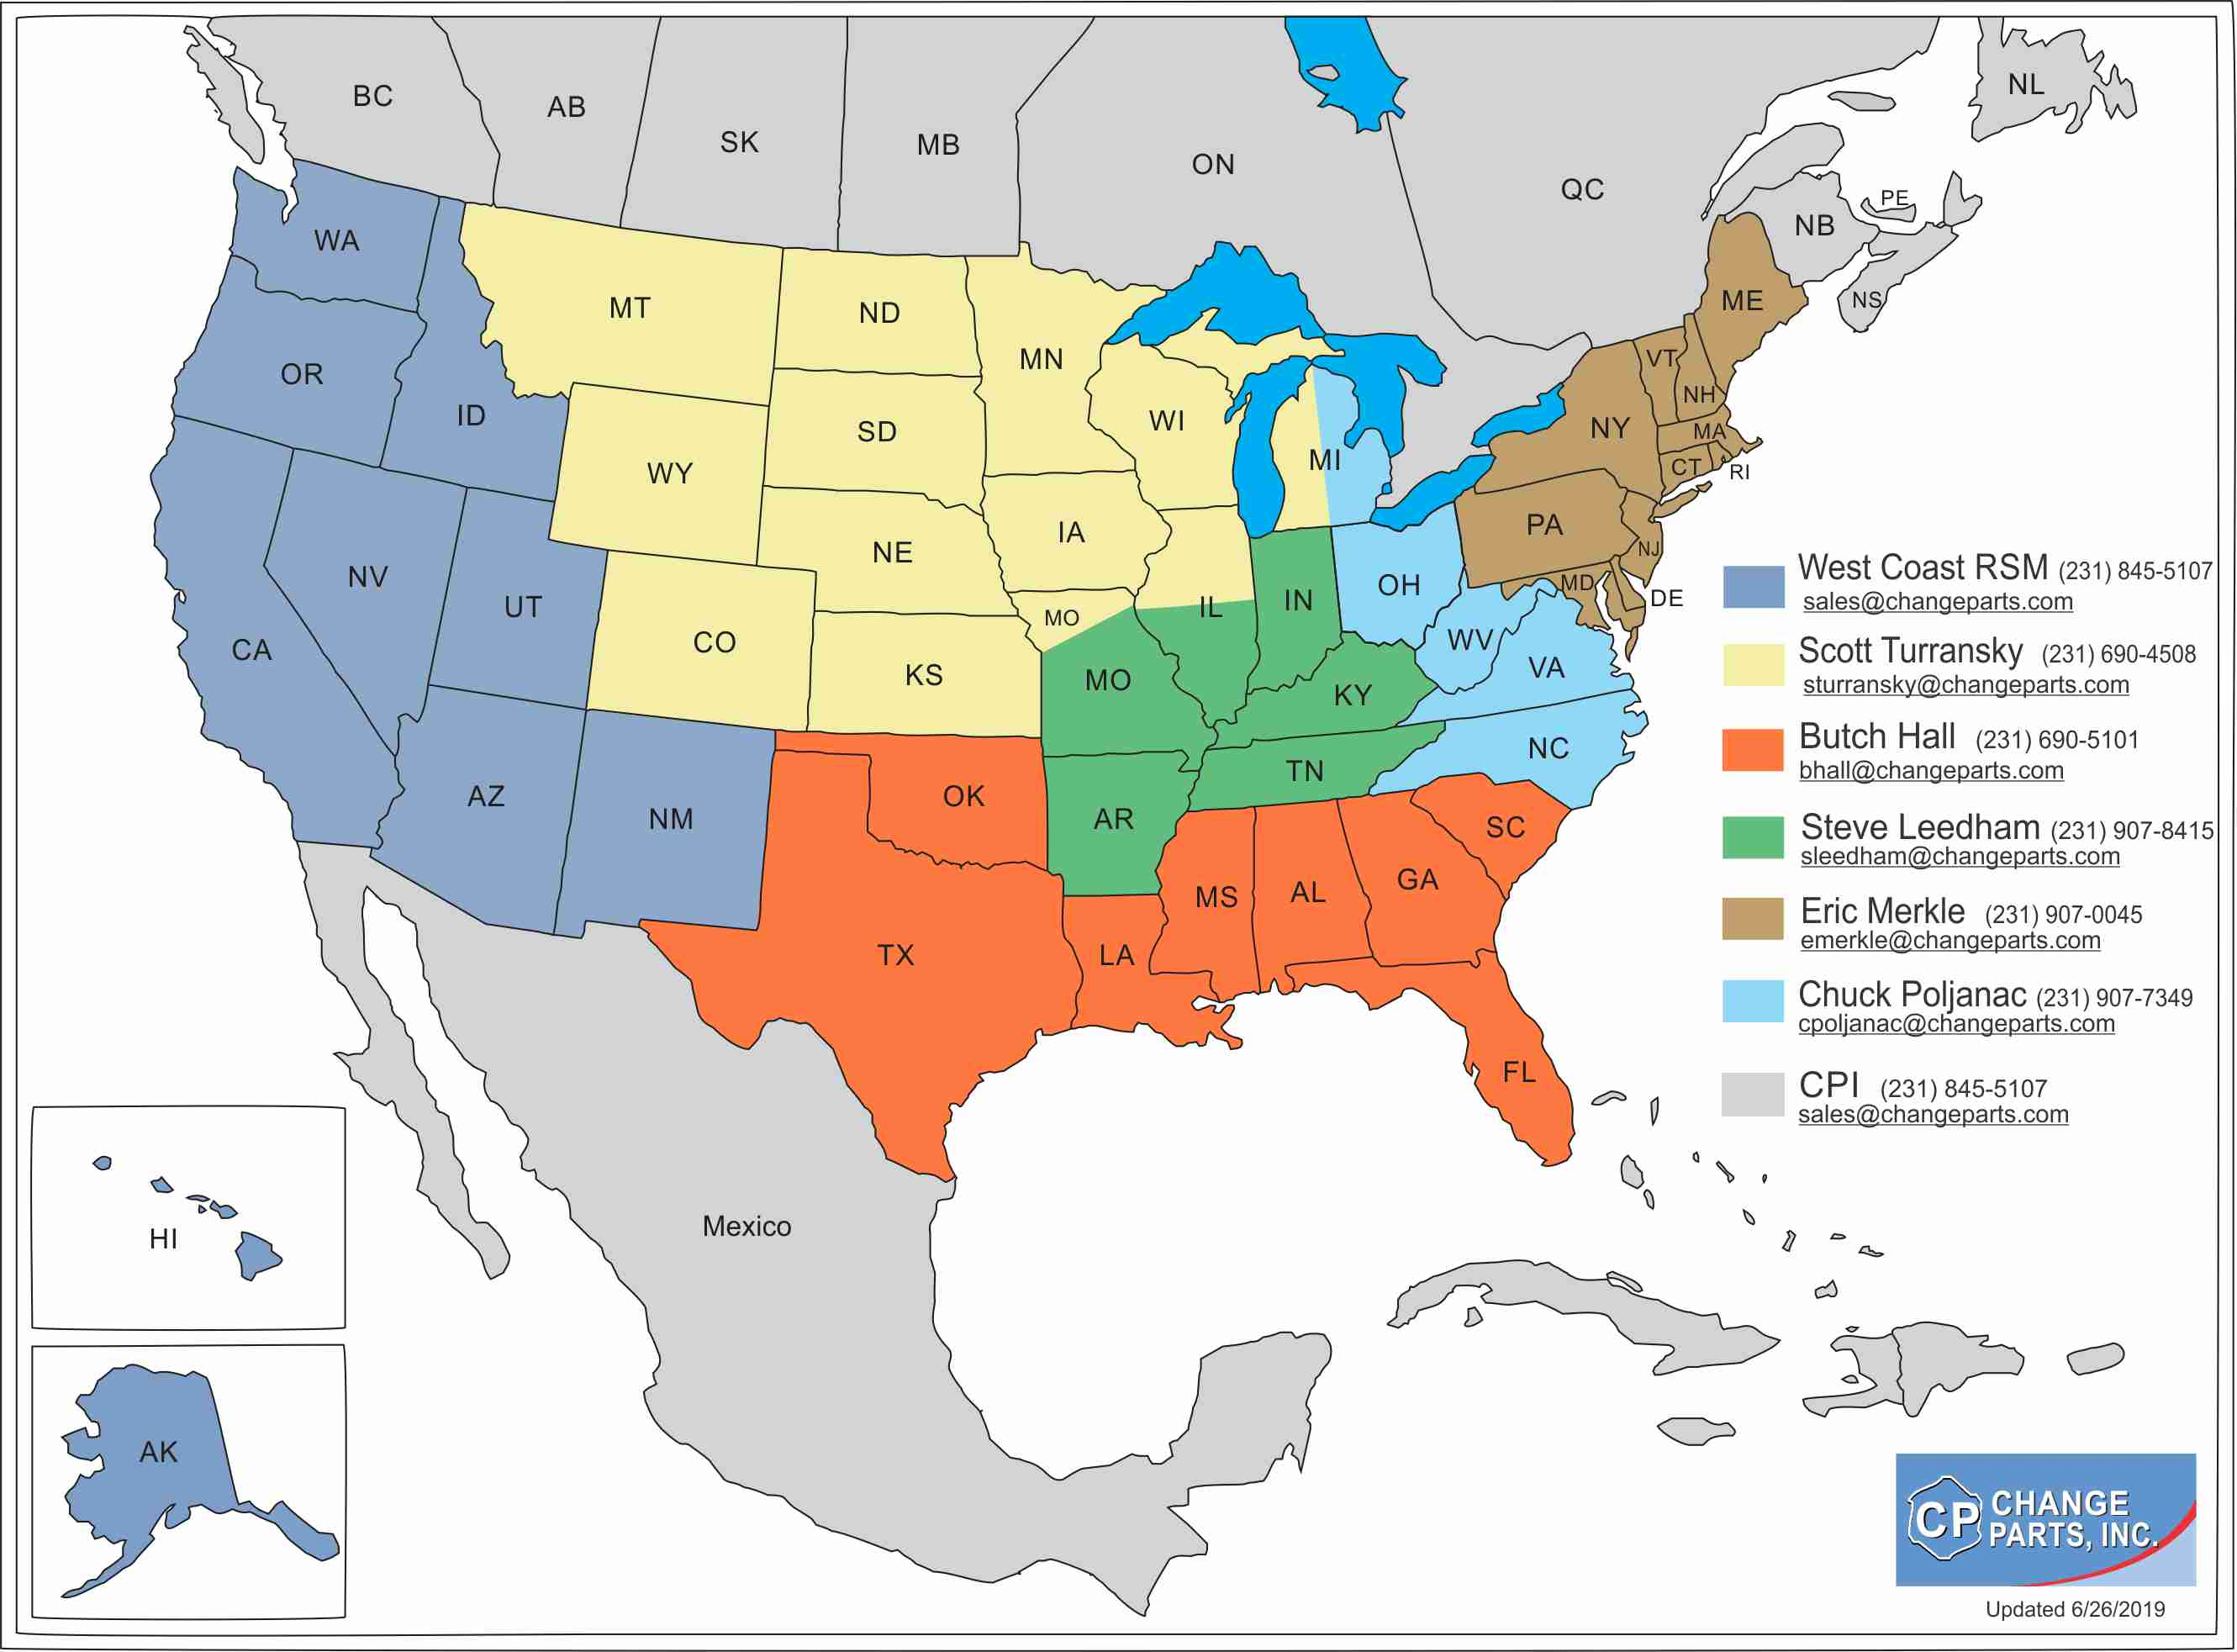 cpi-sales-territory-map-6-26-19.jpg